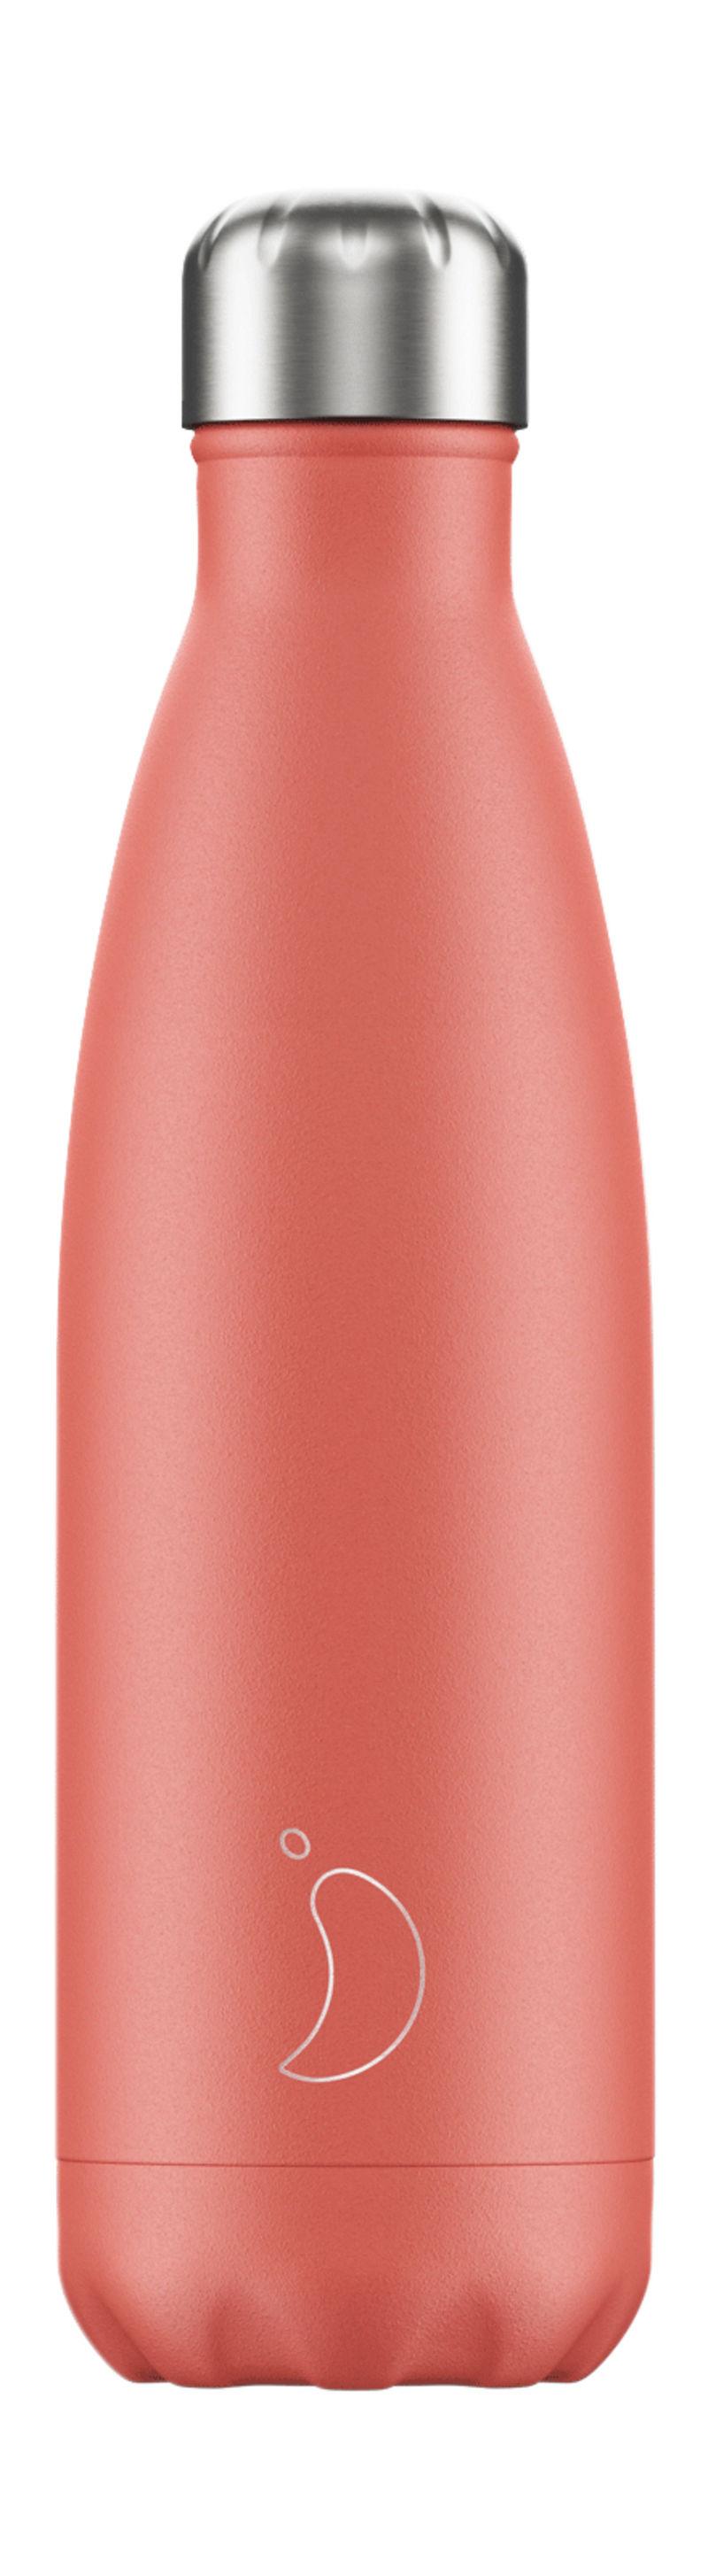 Botella Inox Coral Pastel 500ml -